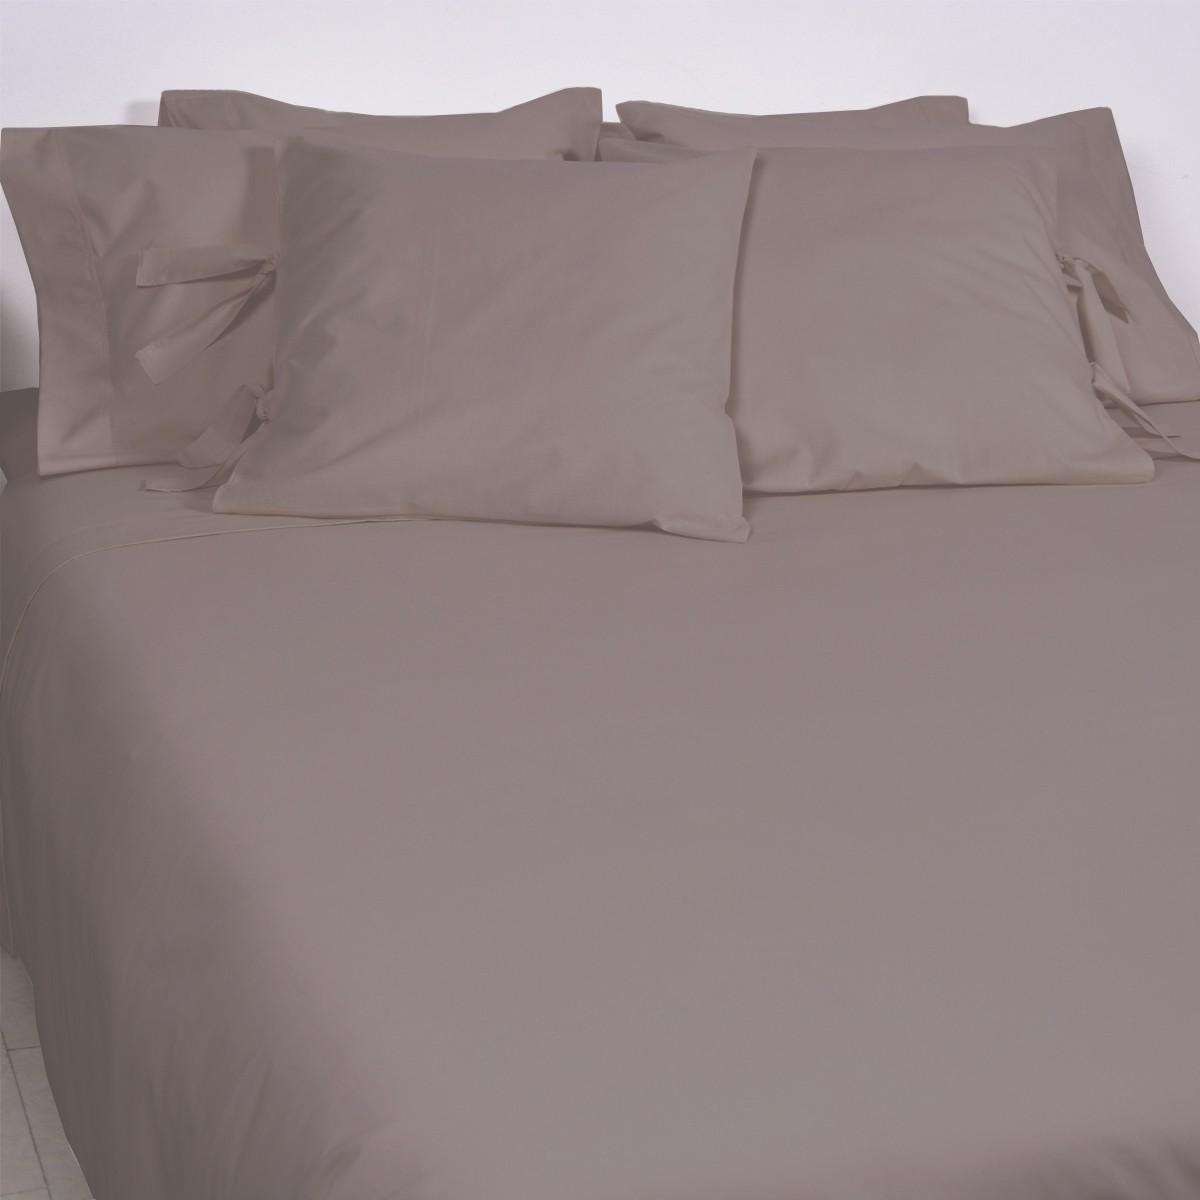 Housse de couette Nude Coton, LAMEIRINHO